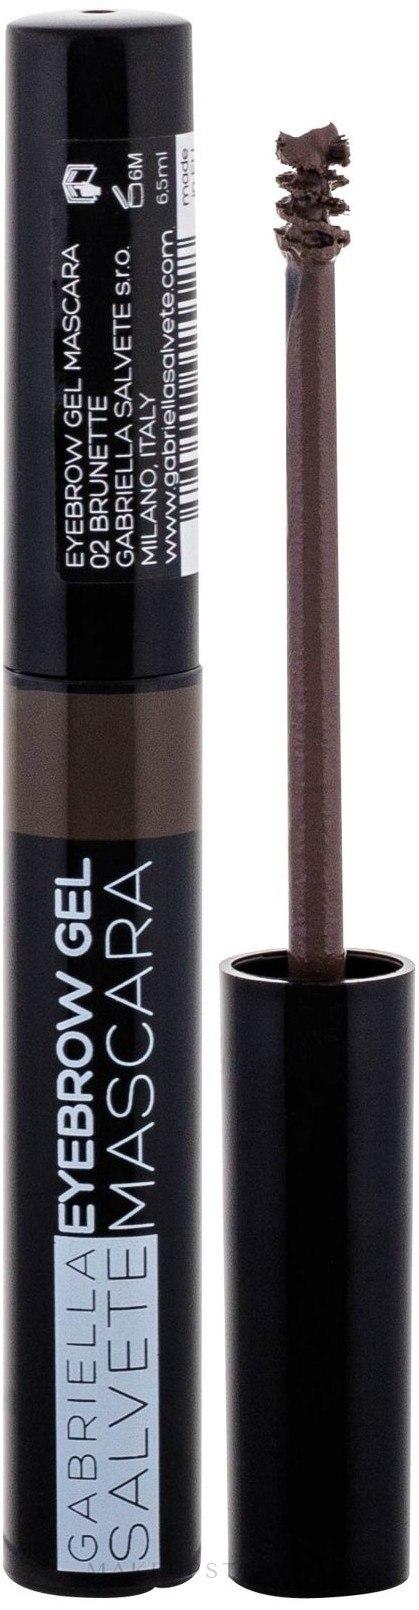 Augenbrauen-Mascara - Gabriella Salvete Eyebrow Gel Mascara — Bild 02